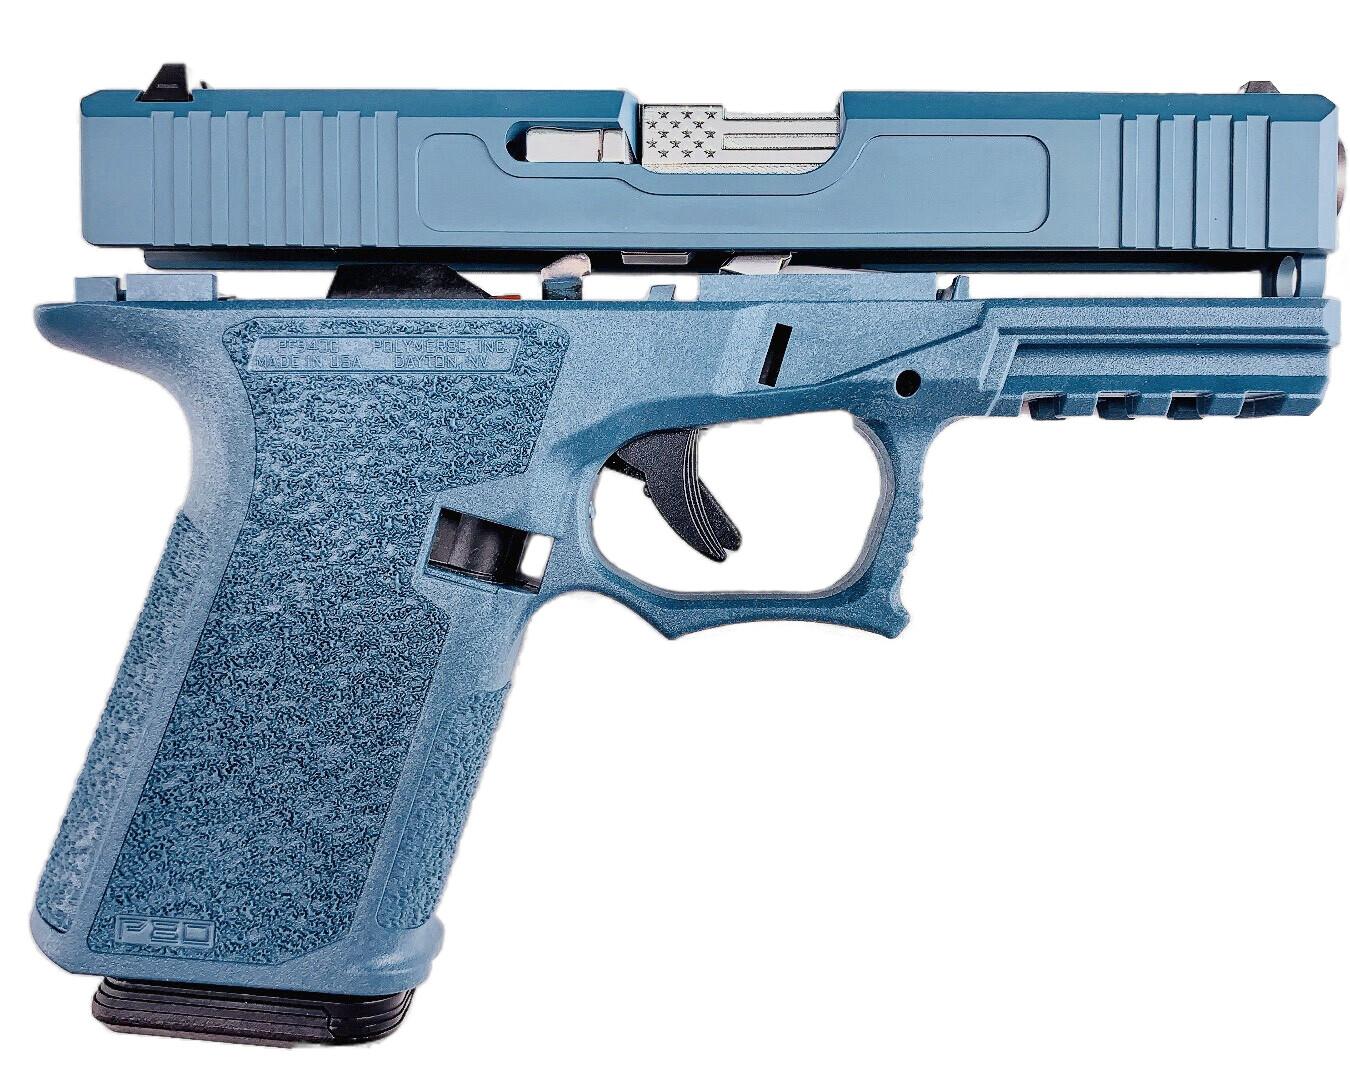 "Patriot G19 80% Stainless ""U.S. Flag"" Pistol Build Kit 9mm - Polymer80 PF940C - Jesse James Blue"